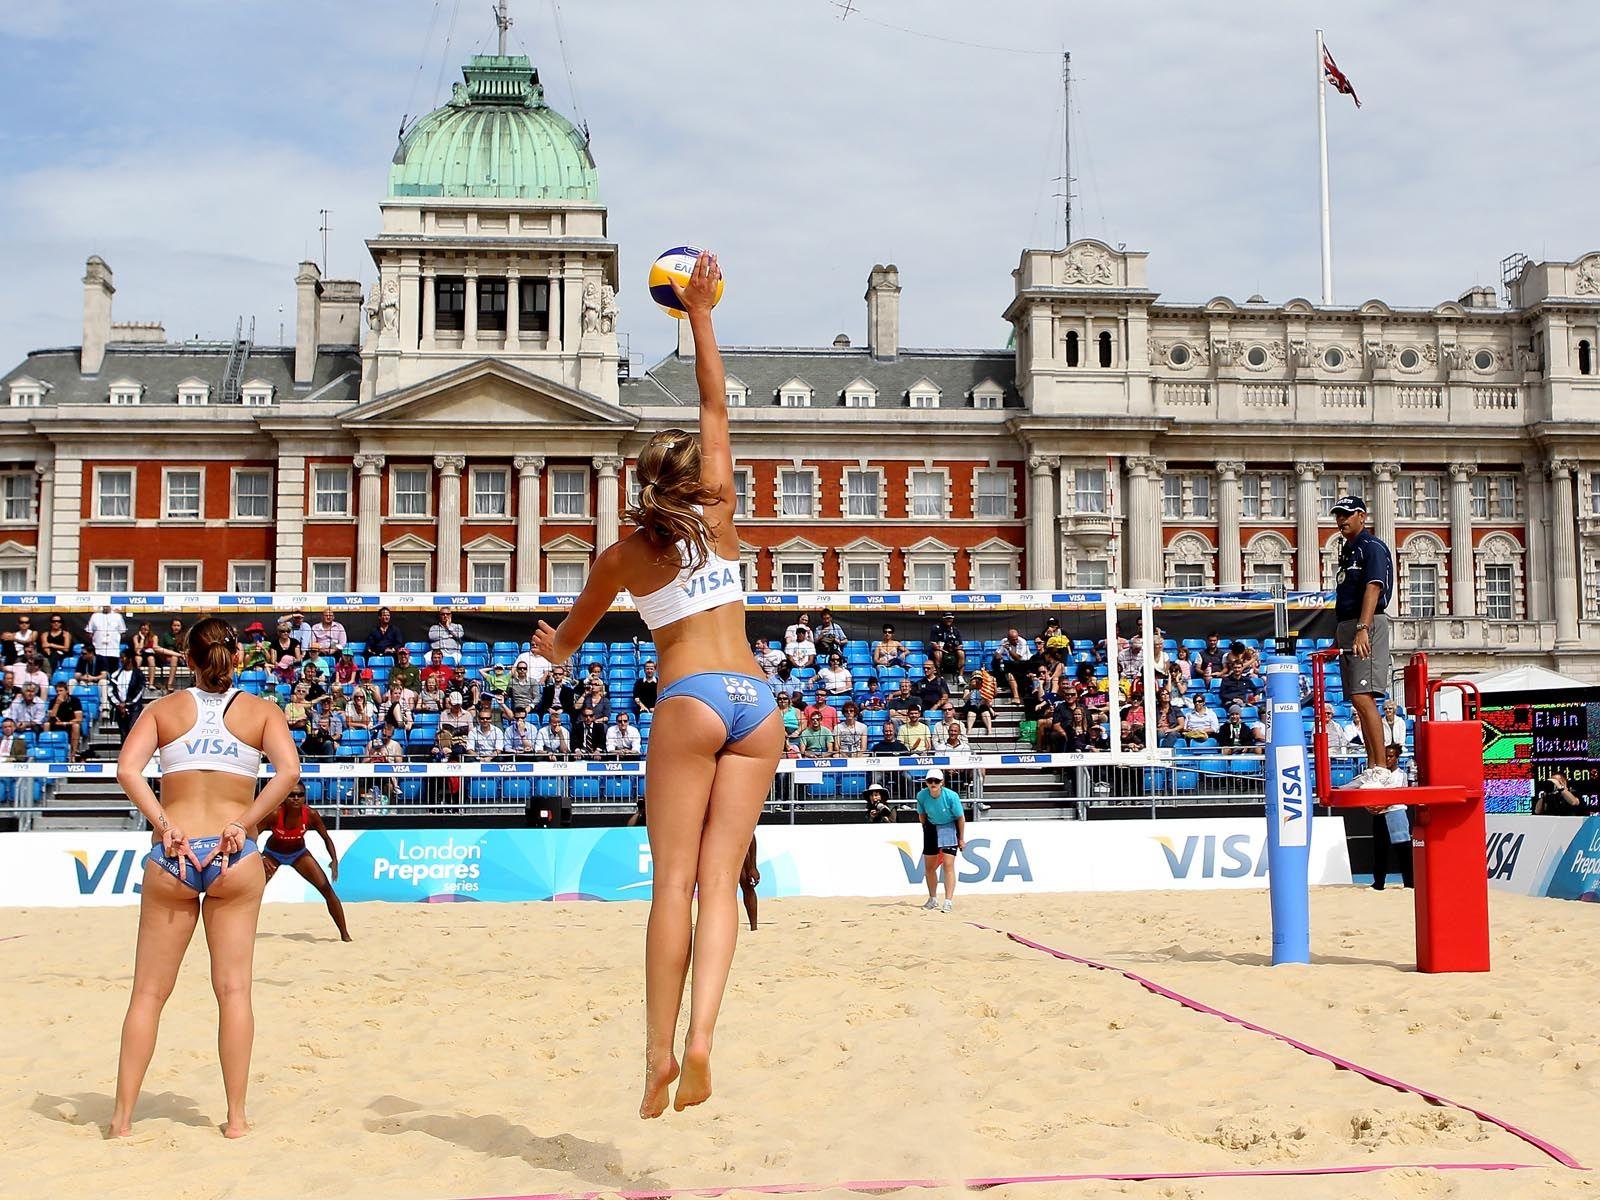 Pin On Beach Volleyball Girls London 2012 Olympics